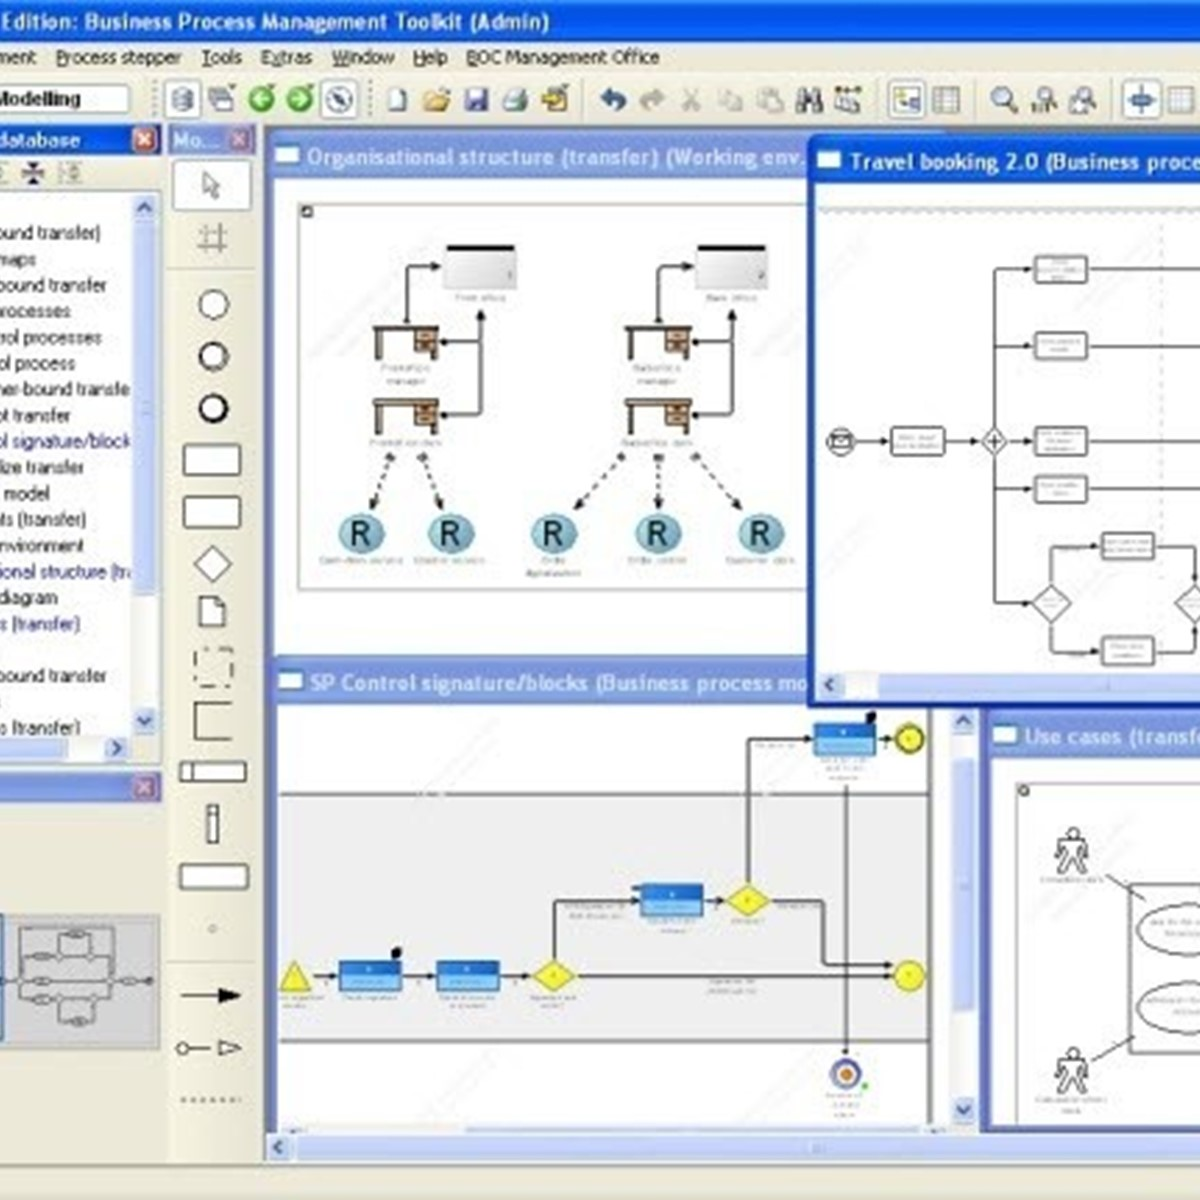 adonisce modelling component - Adonis Bpmn